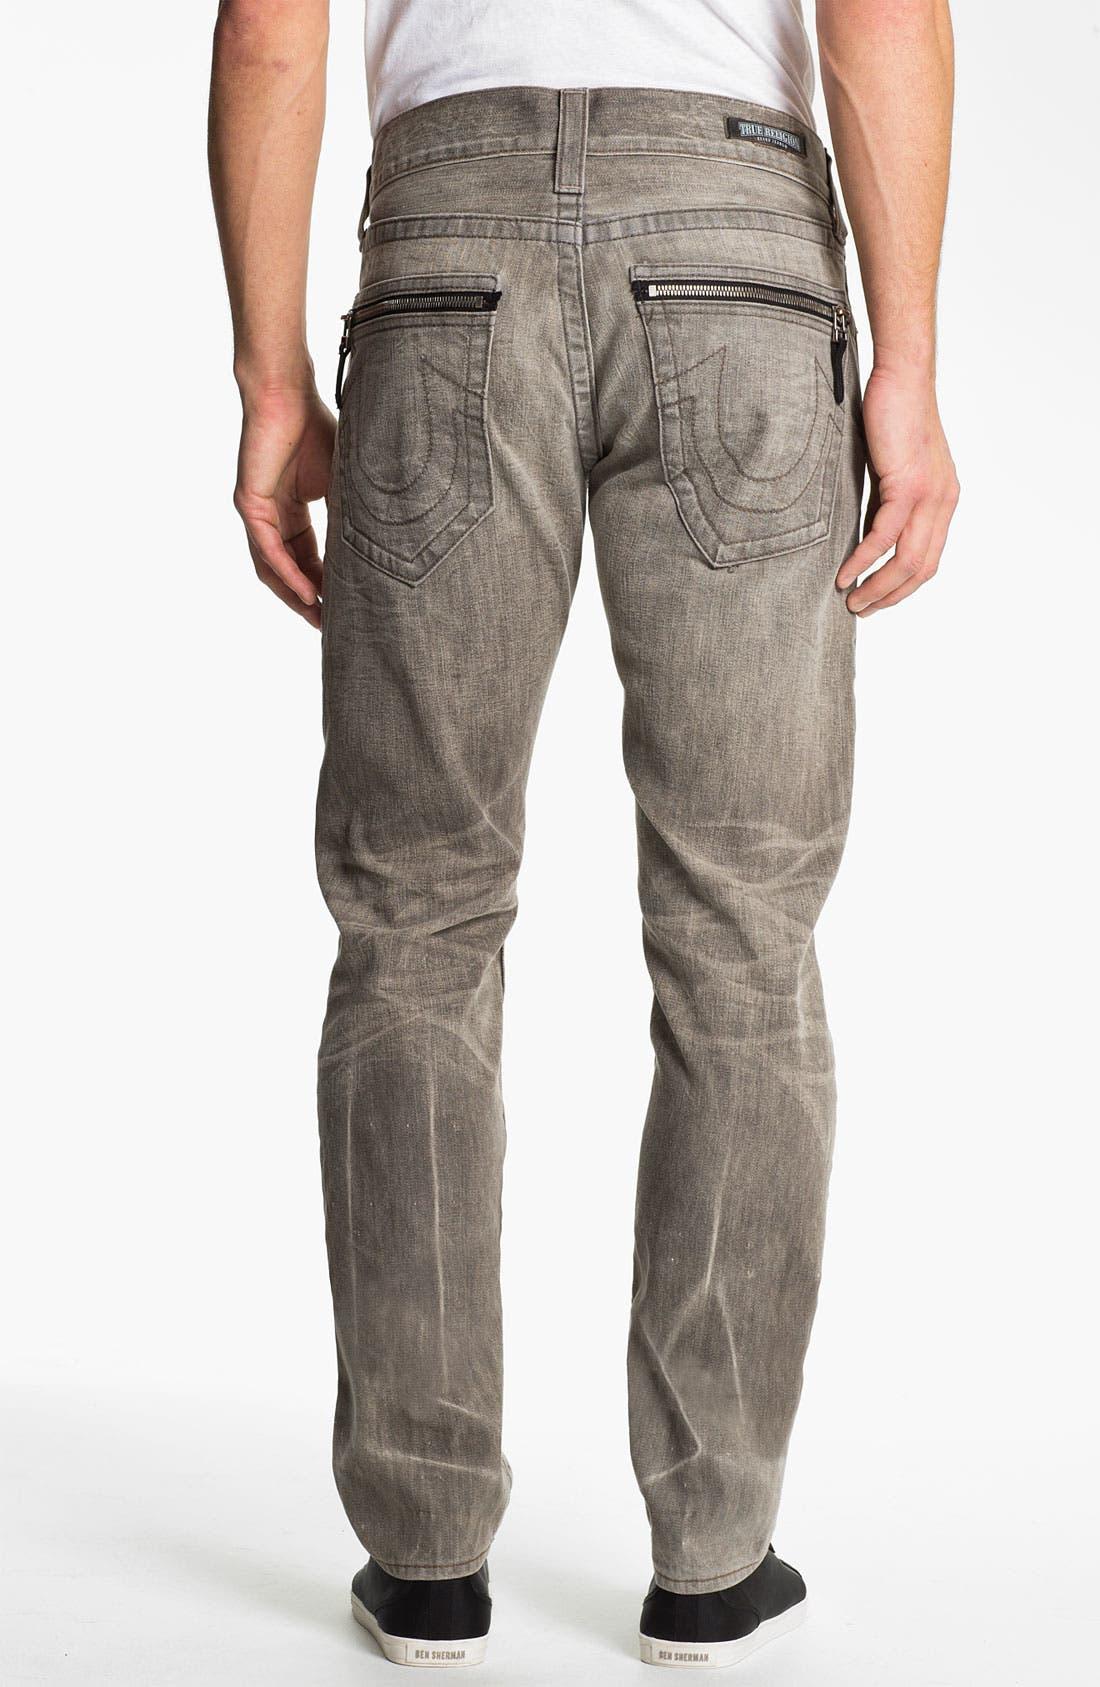 Main Image - True Religion Brand Jeans 'Rocco' Slim Straight Leg Jeans (Ashland) (Online Exclusive)